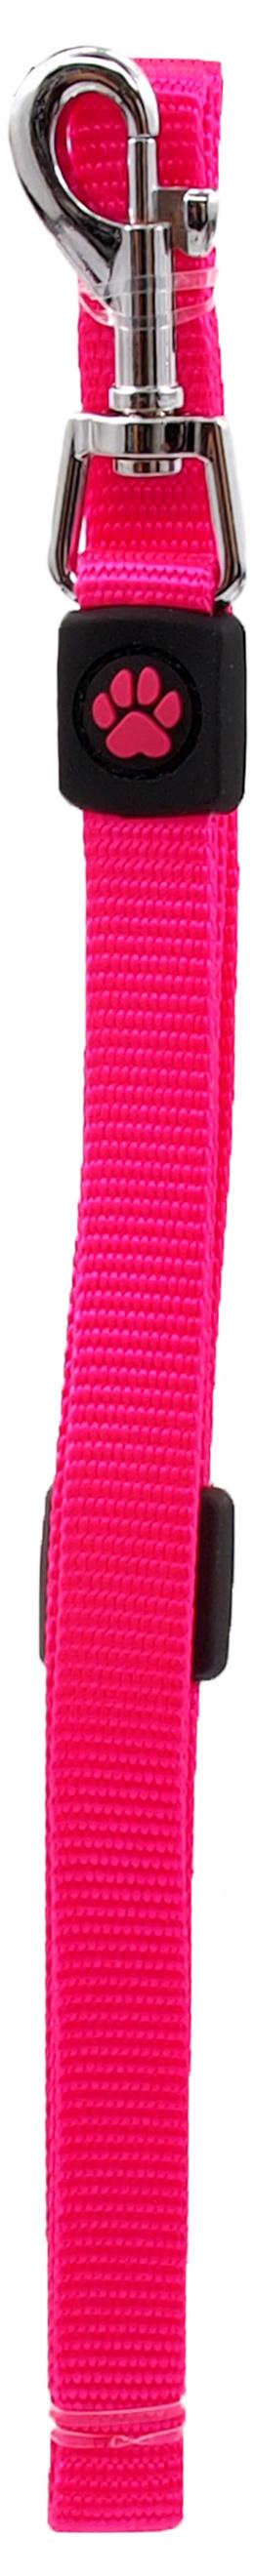 Vodítko Active Dog Premium S růžové 1,5x120cm